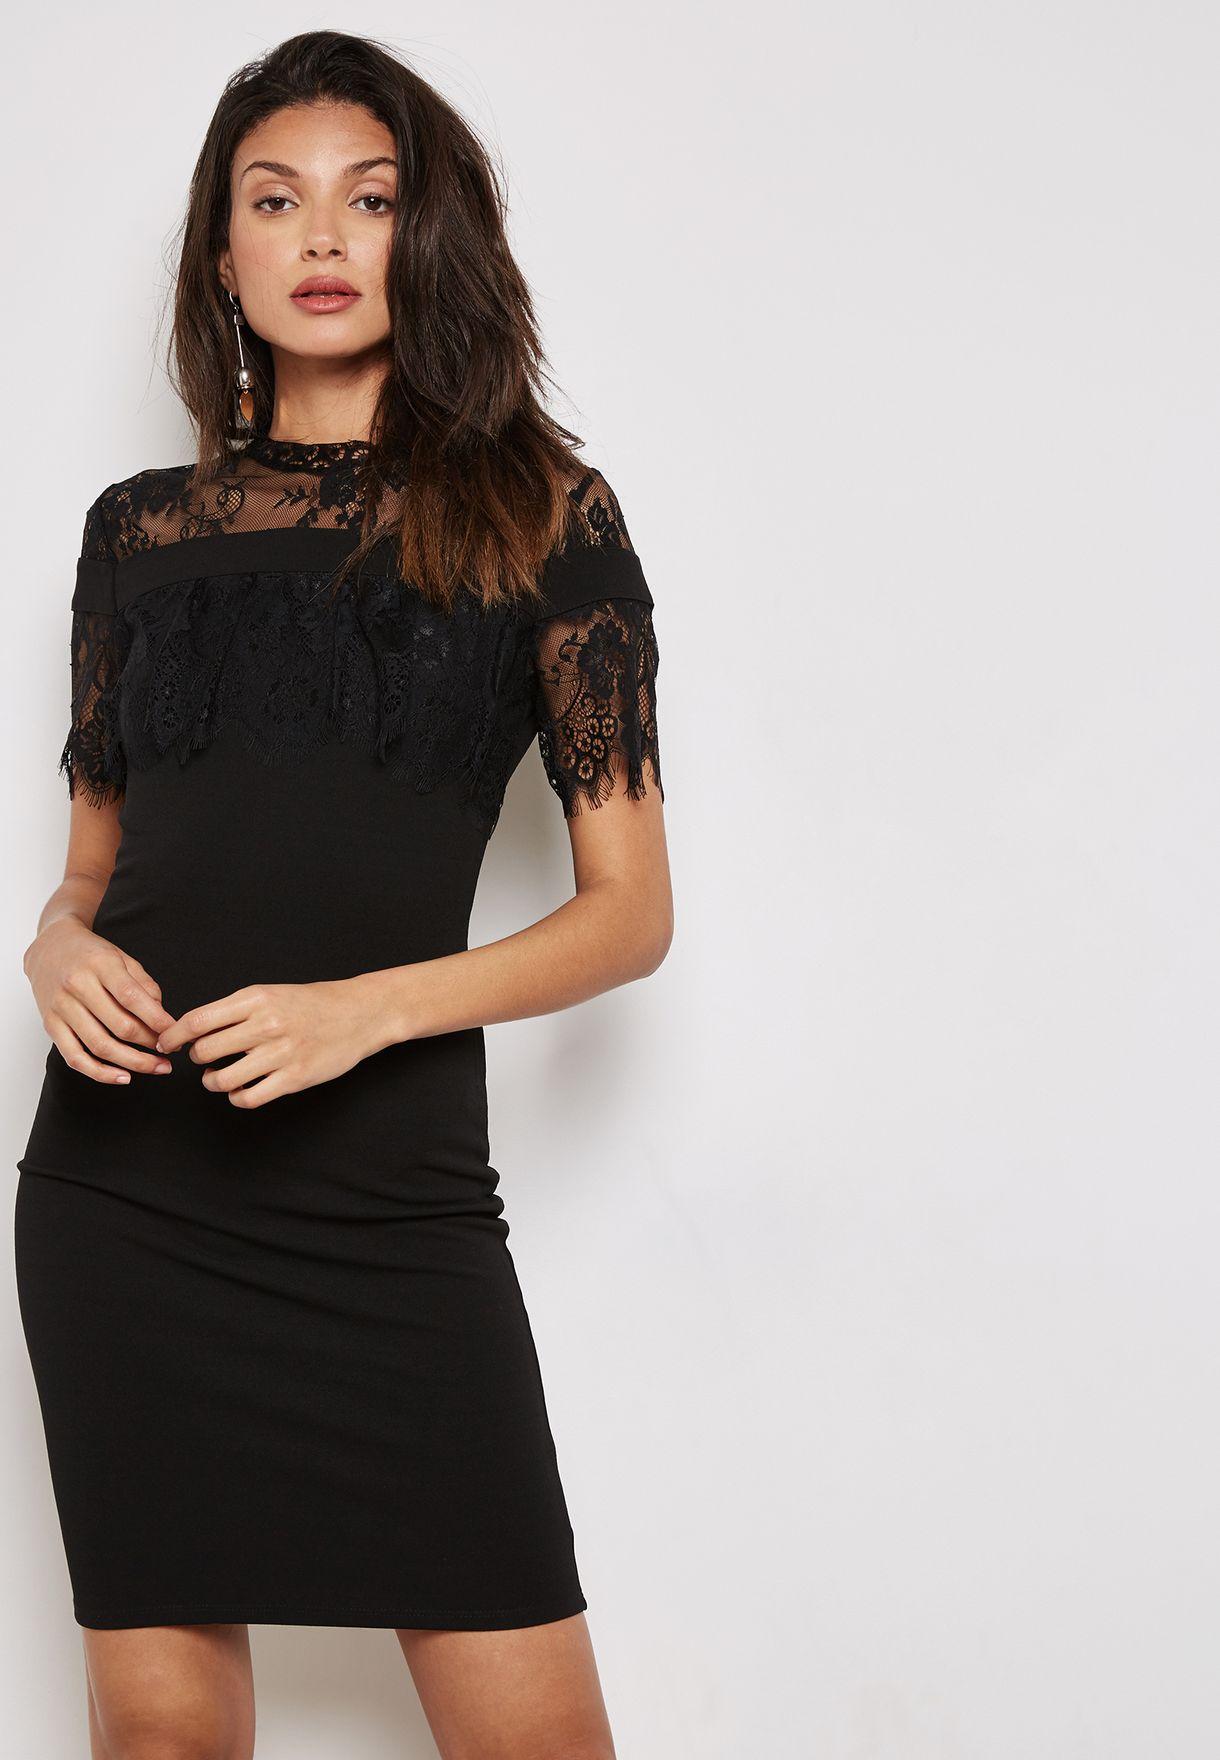 a7500ab3ca Shop Ella black Lace Yoke Ruffle Detail Midi Dress QED0276 for Women ...